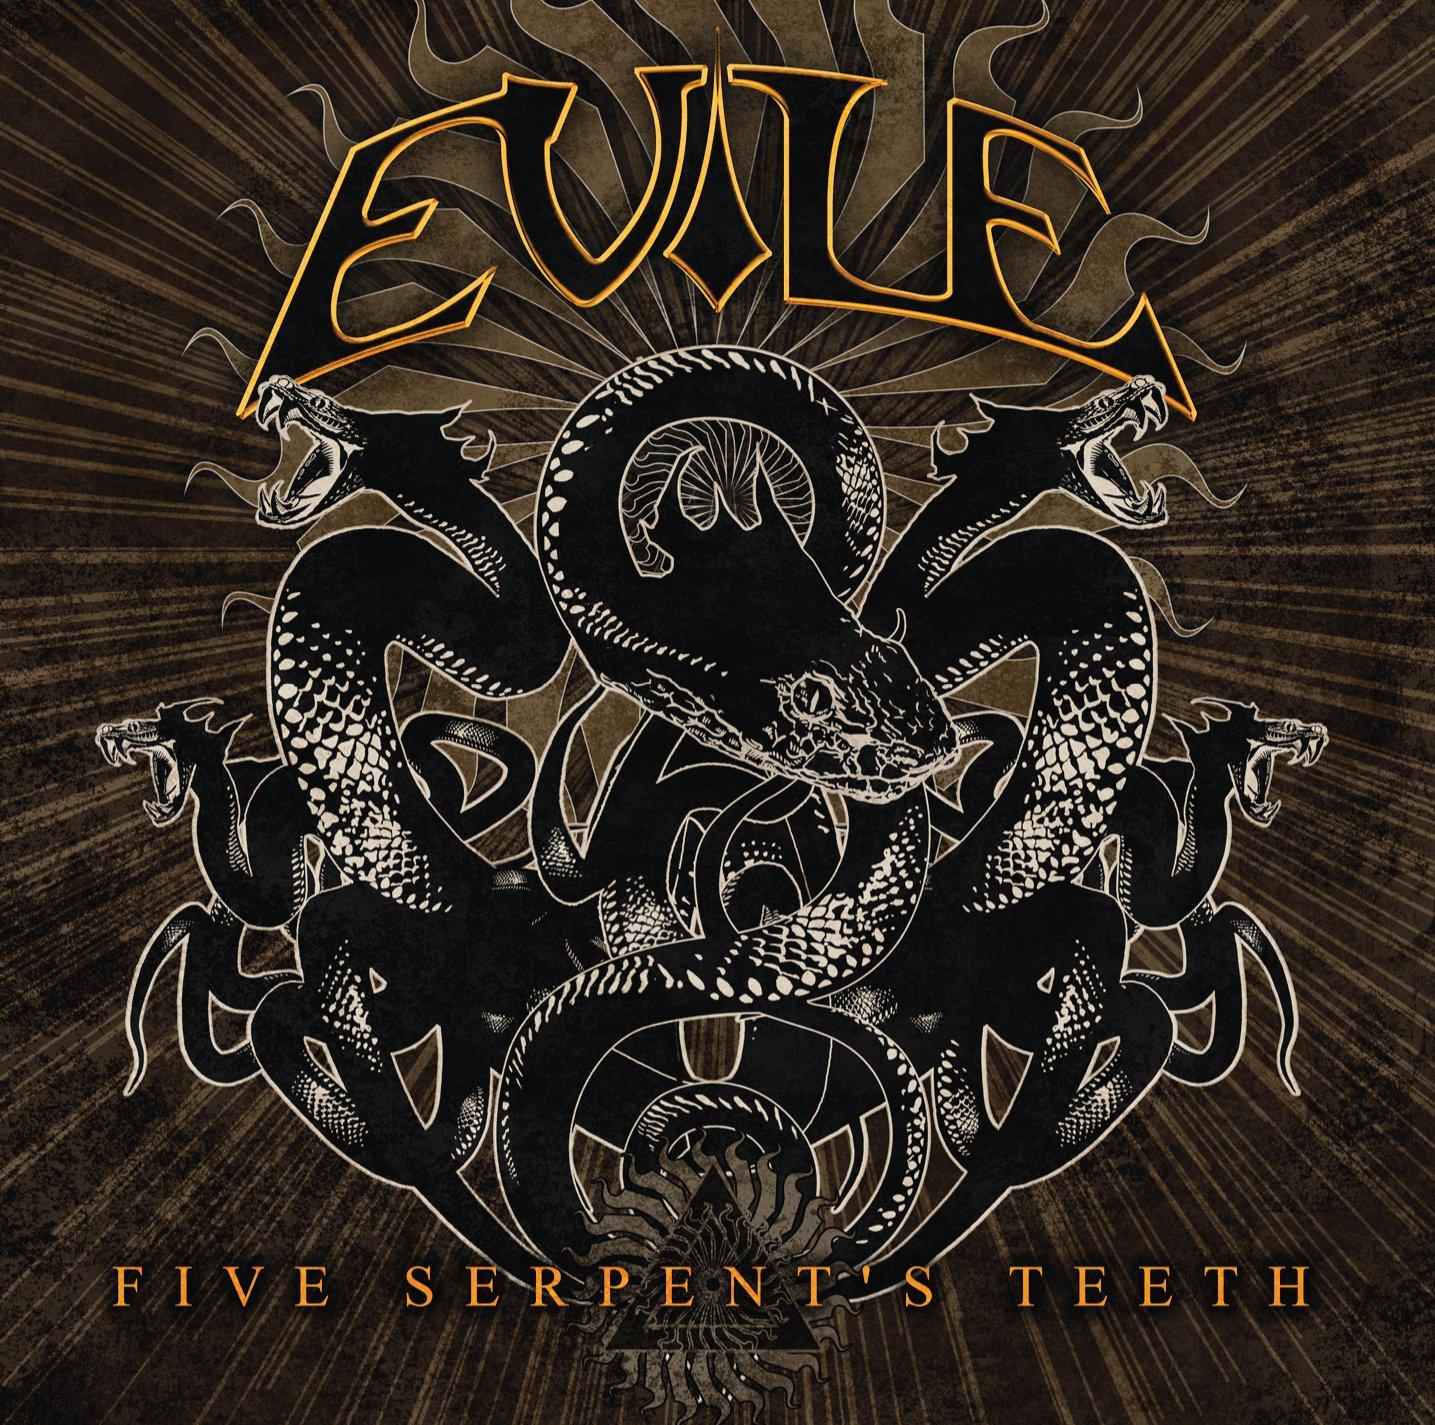 Evile - Five Serpent's Teeth - Amazon.com Music